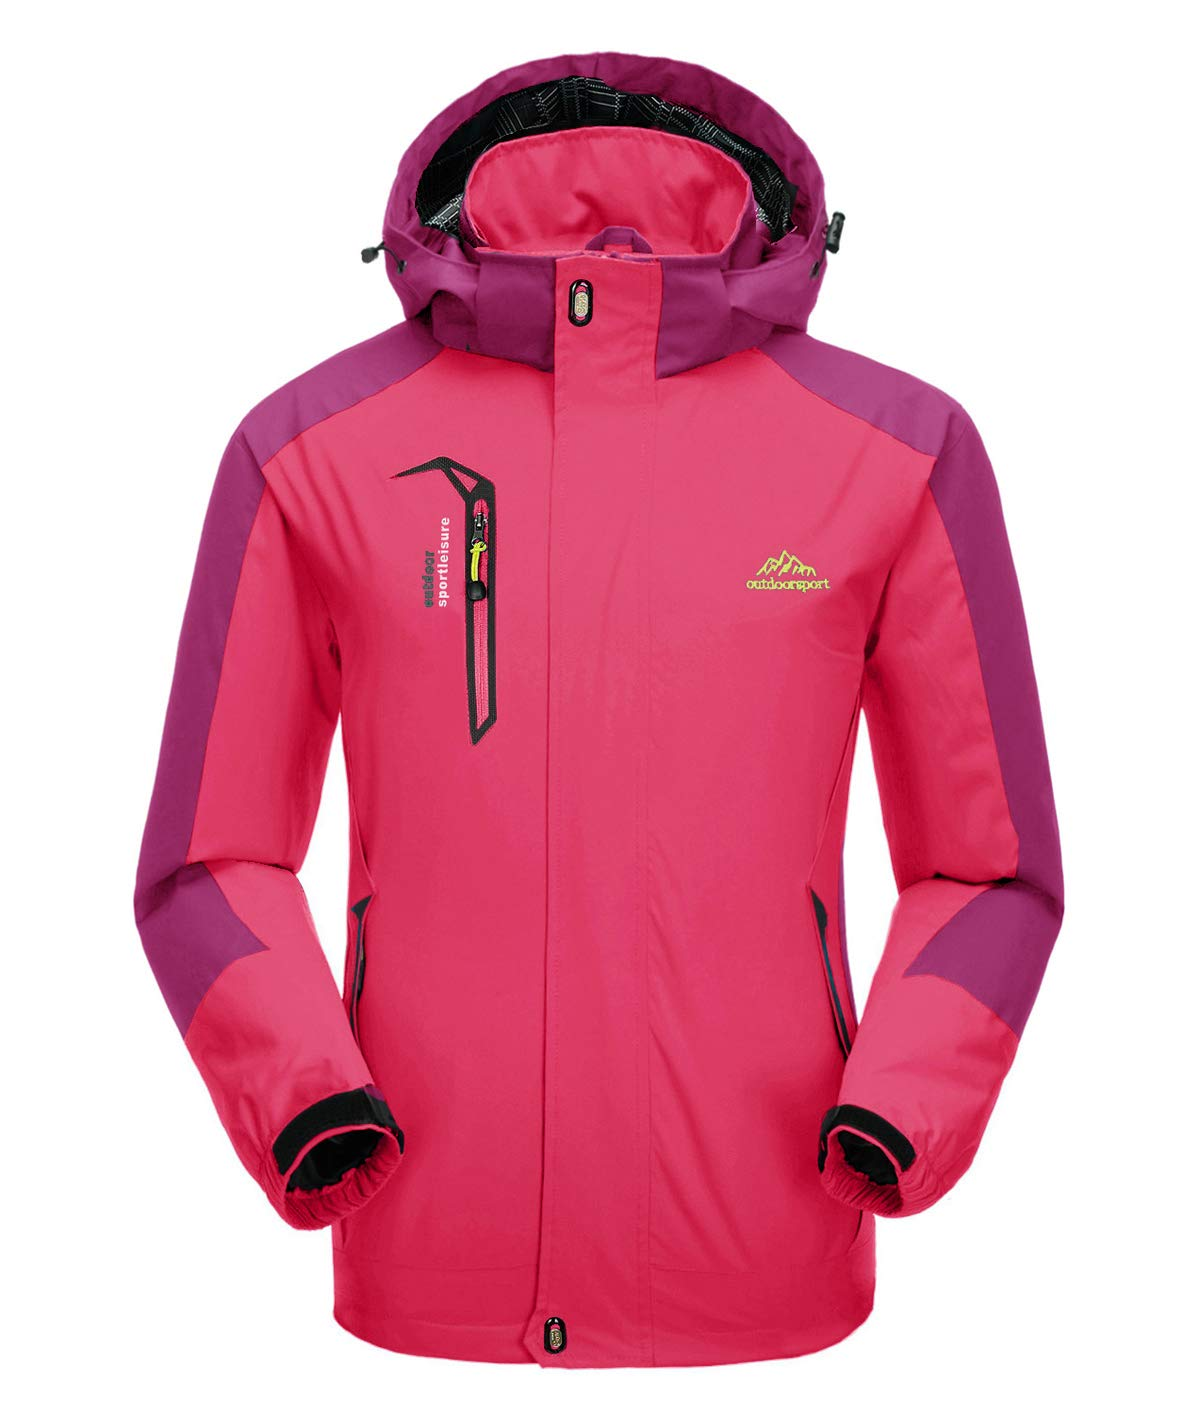 KEFITEVD Women's Waterproof Mountain Jacket Lightweight Outdoor Rain Jackets with Detachtable Hood FEIXUN KEF-59